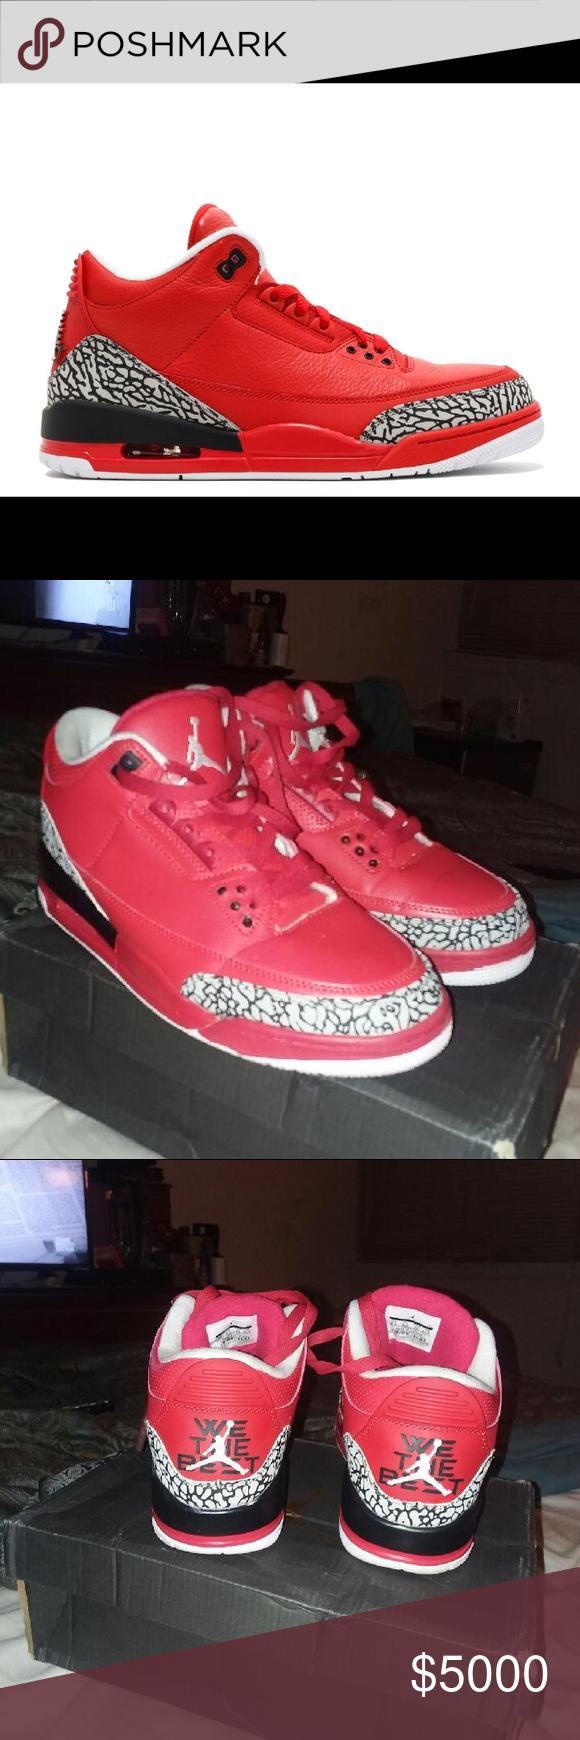 quality design 5208f dac83 Air Jordan Retro 3's DJ Khaled We the best... worn twice ...